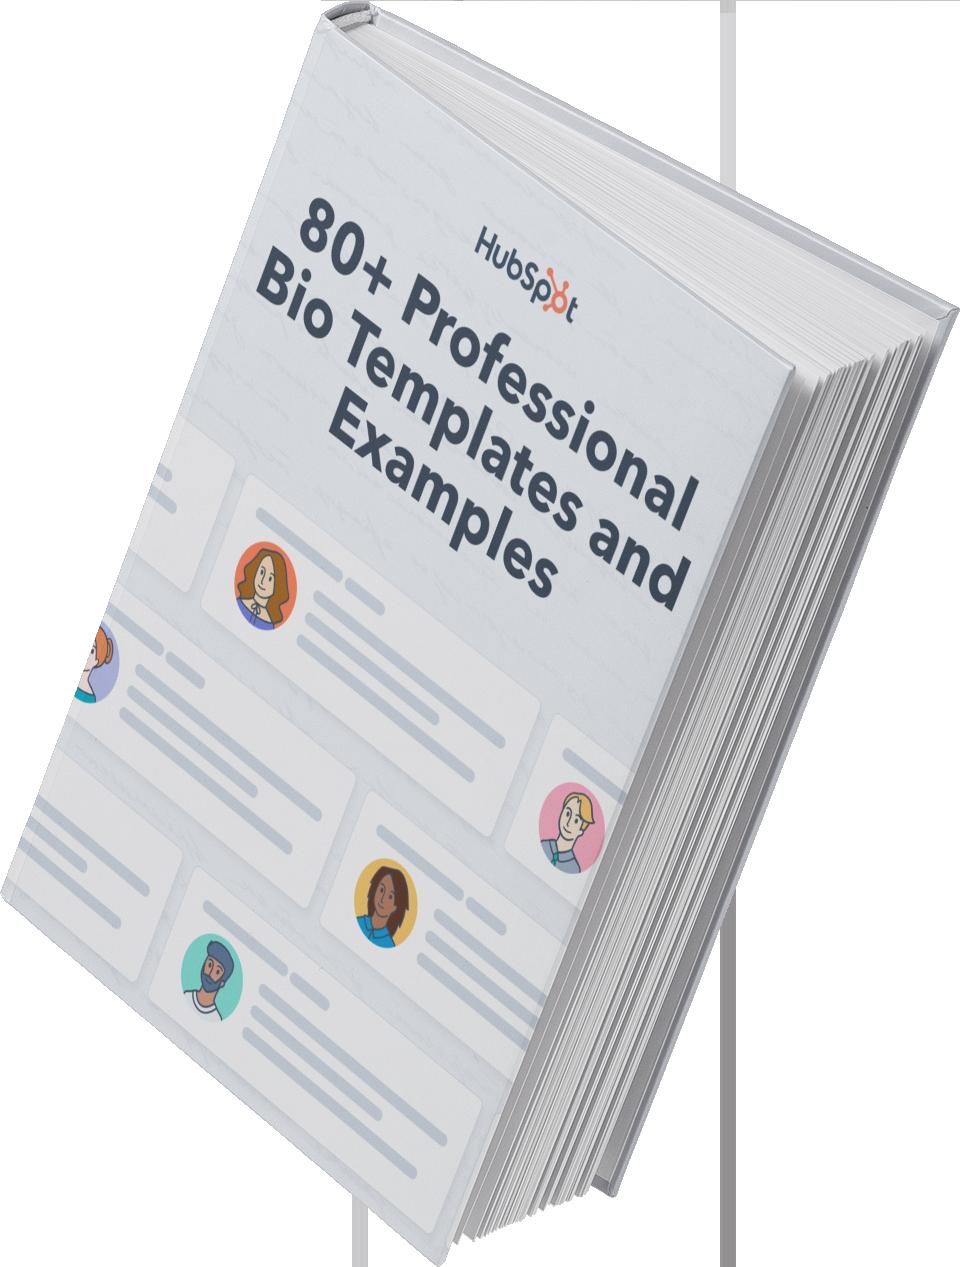 80+ Professional Bio Templates & Examples